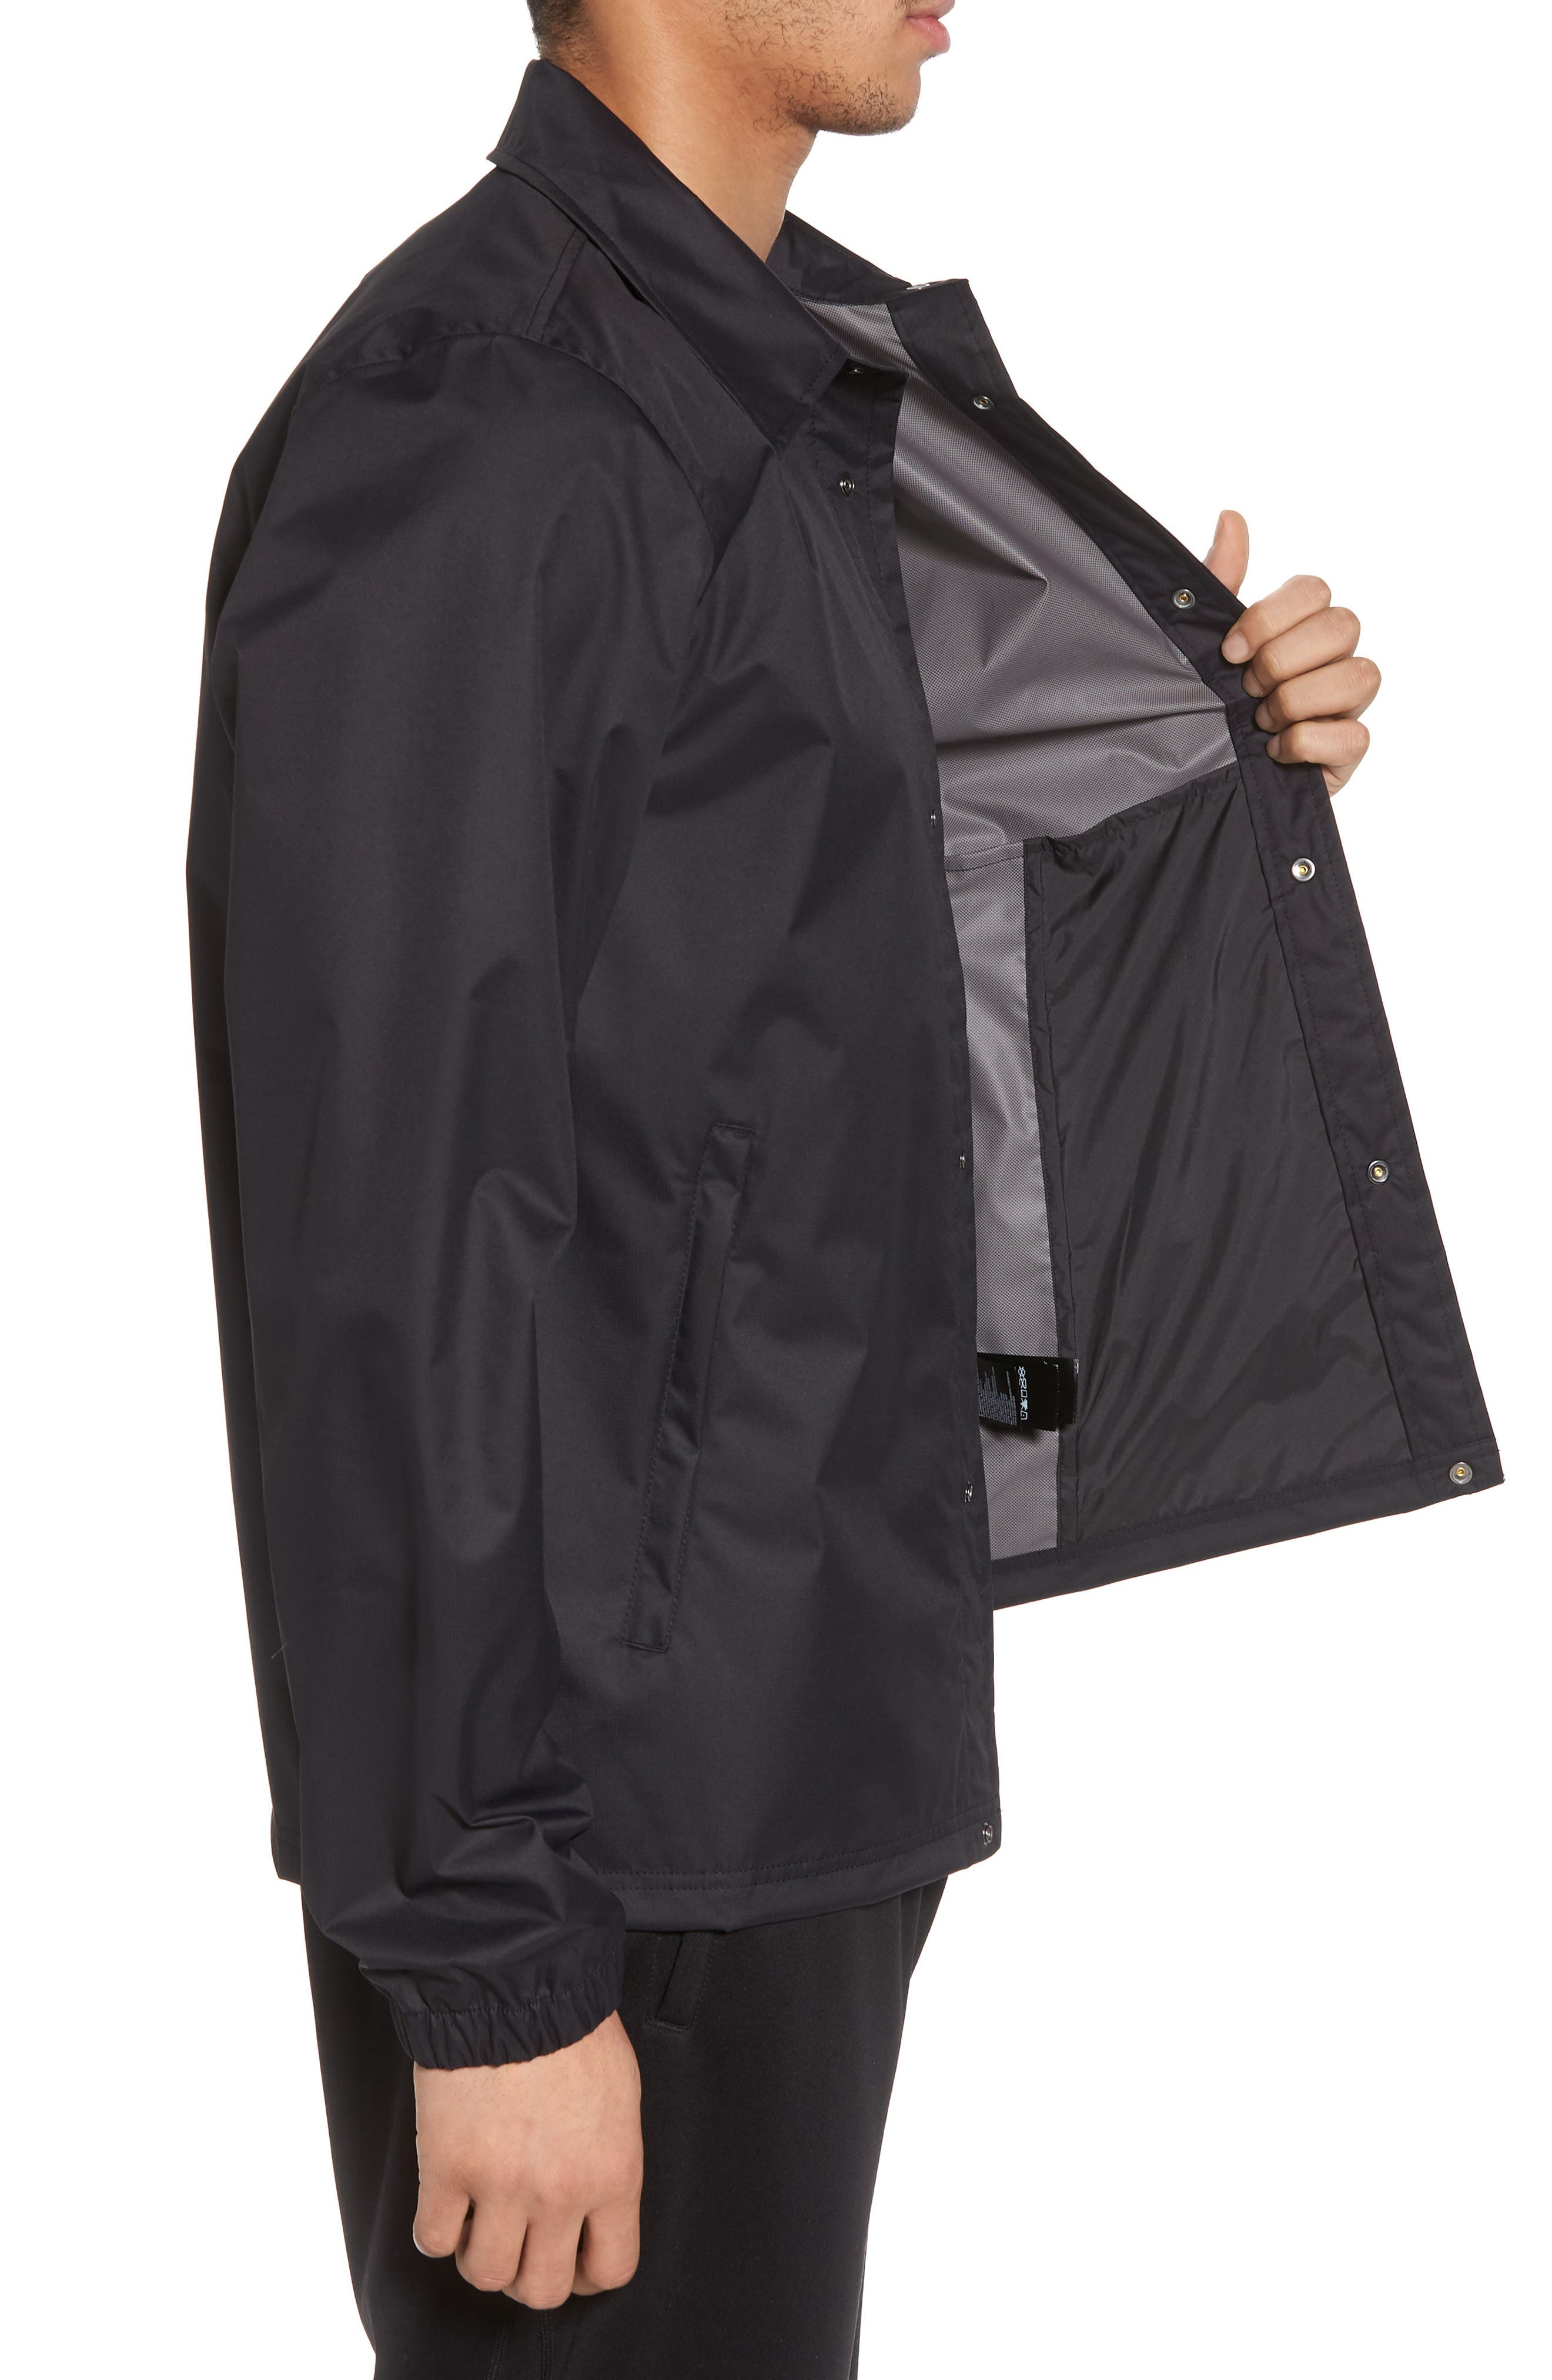 Coaches Rain Jacket,                             Alternate thumbnail 3, color,                             001